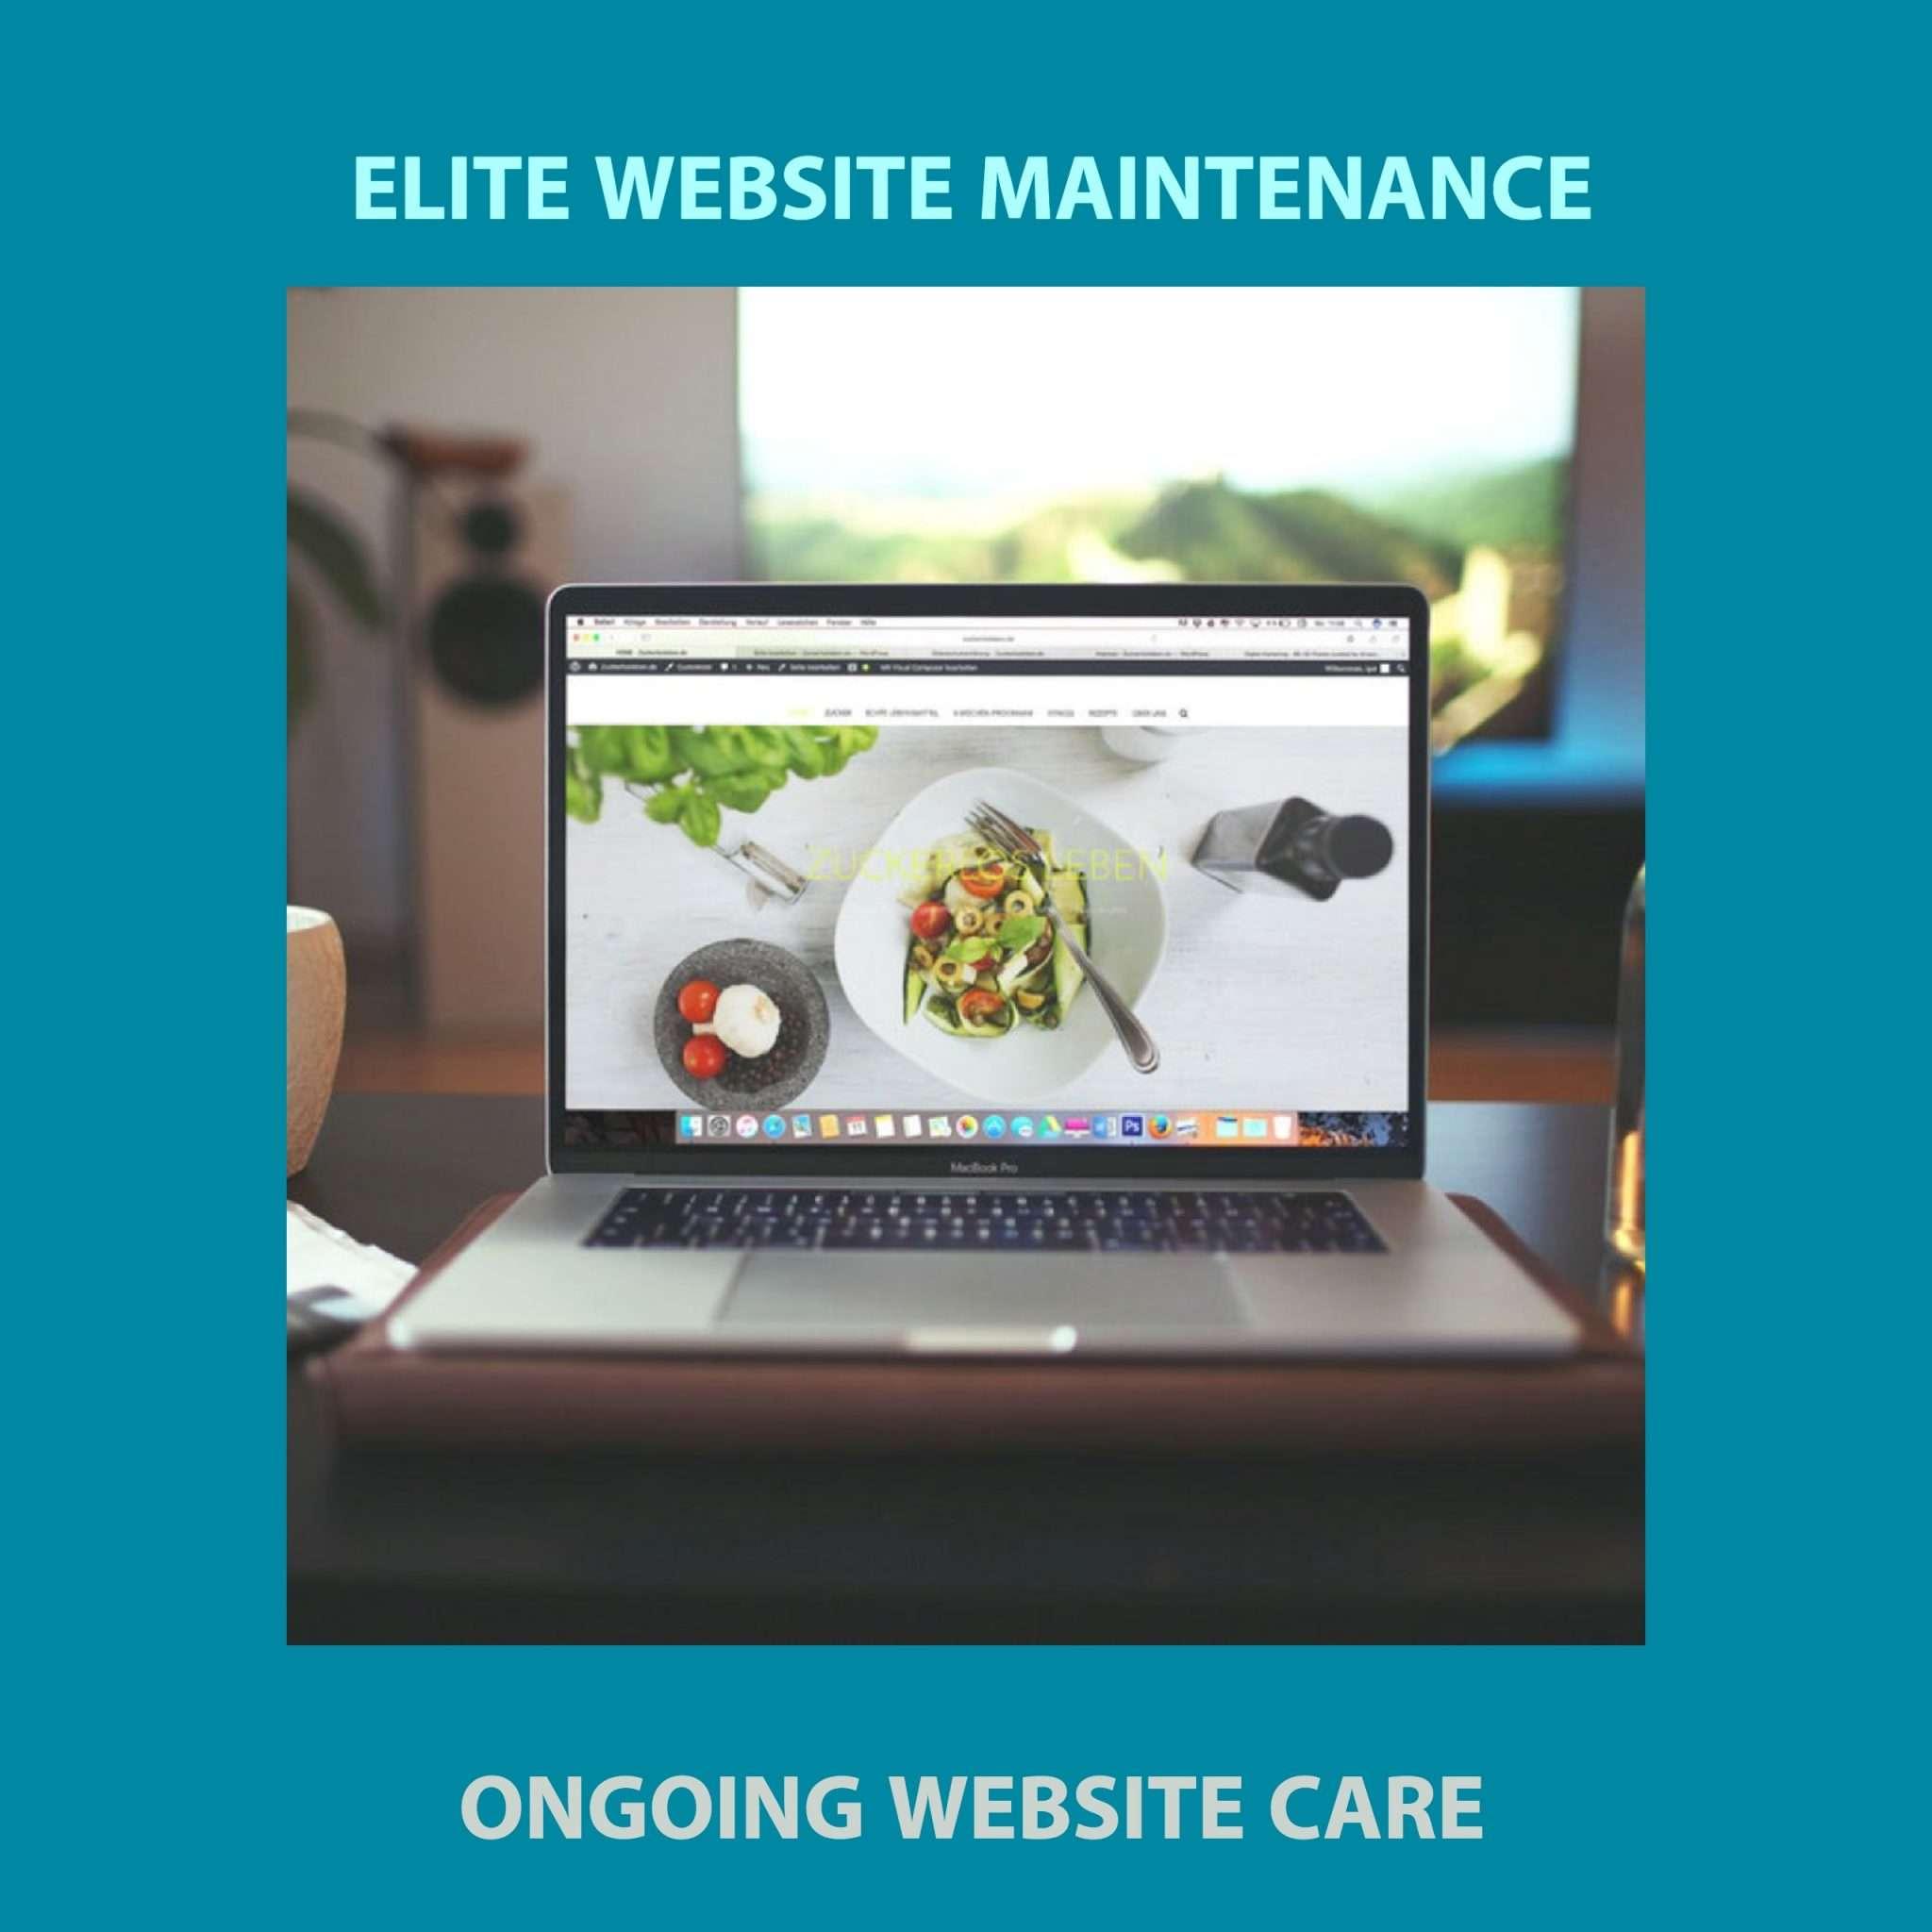 Elite website